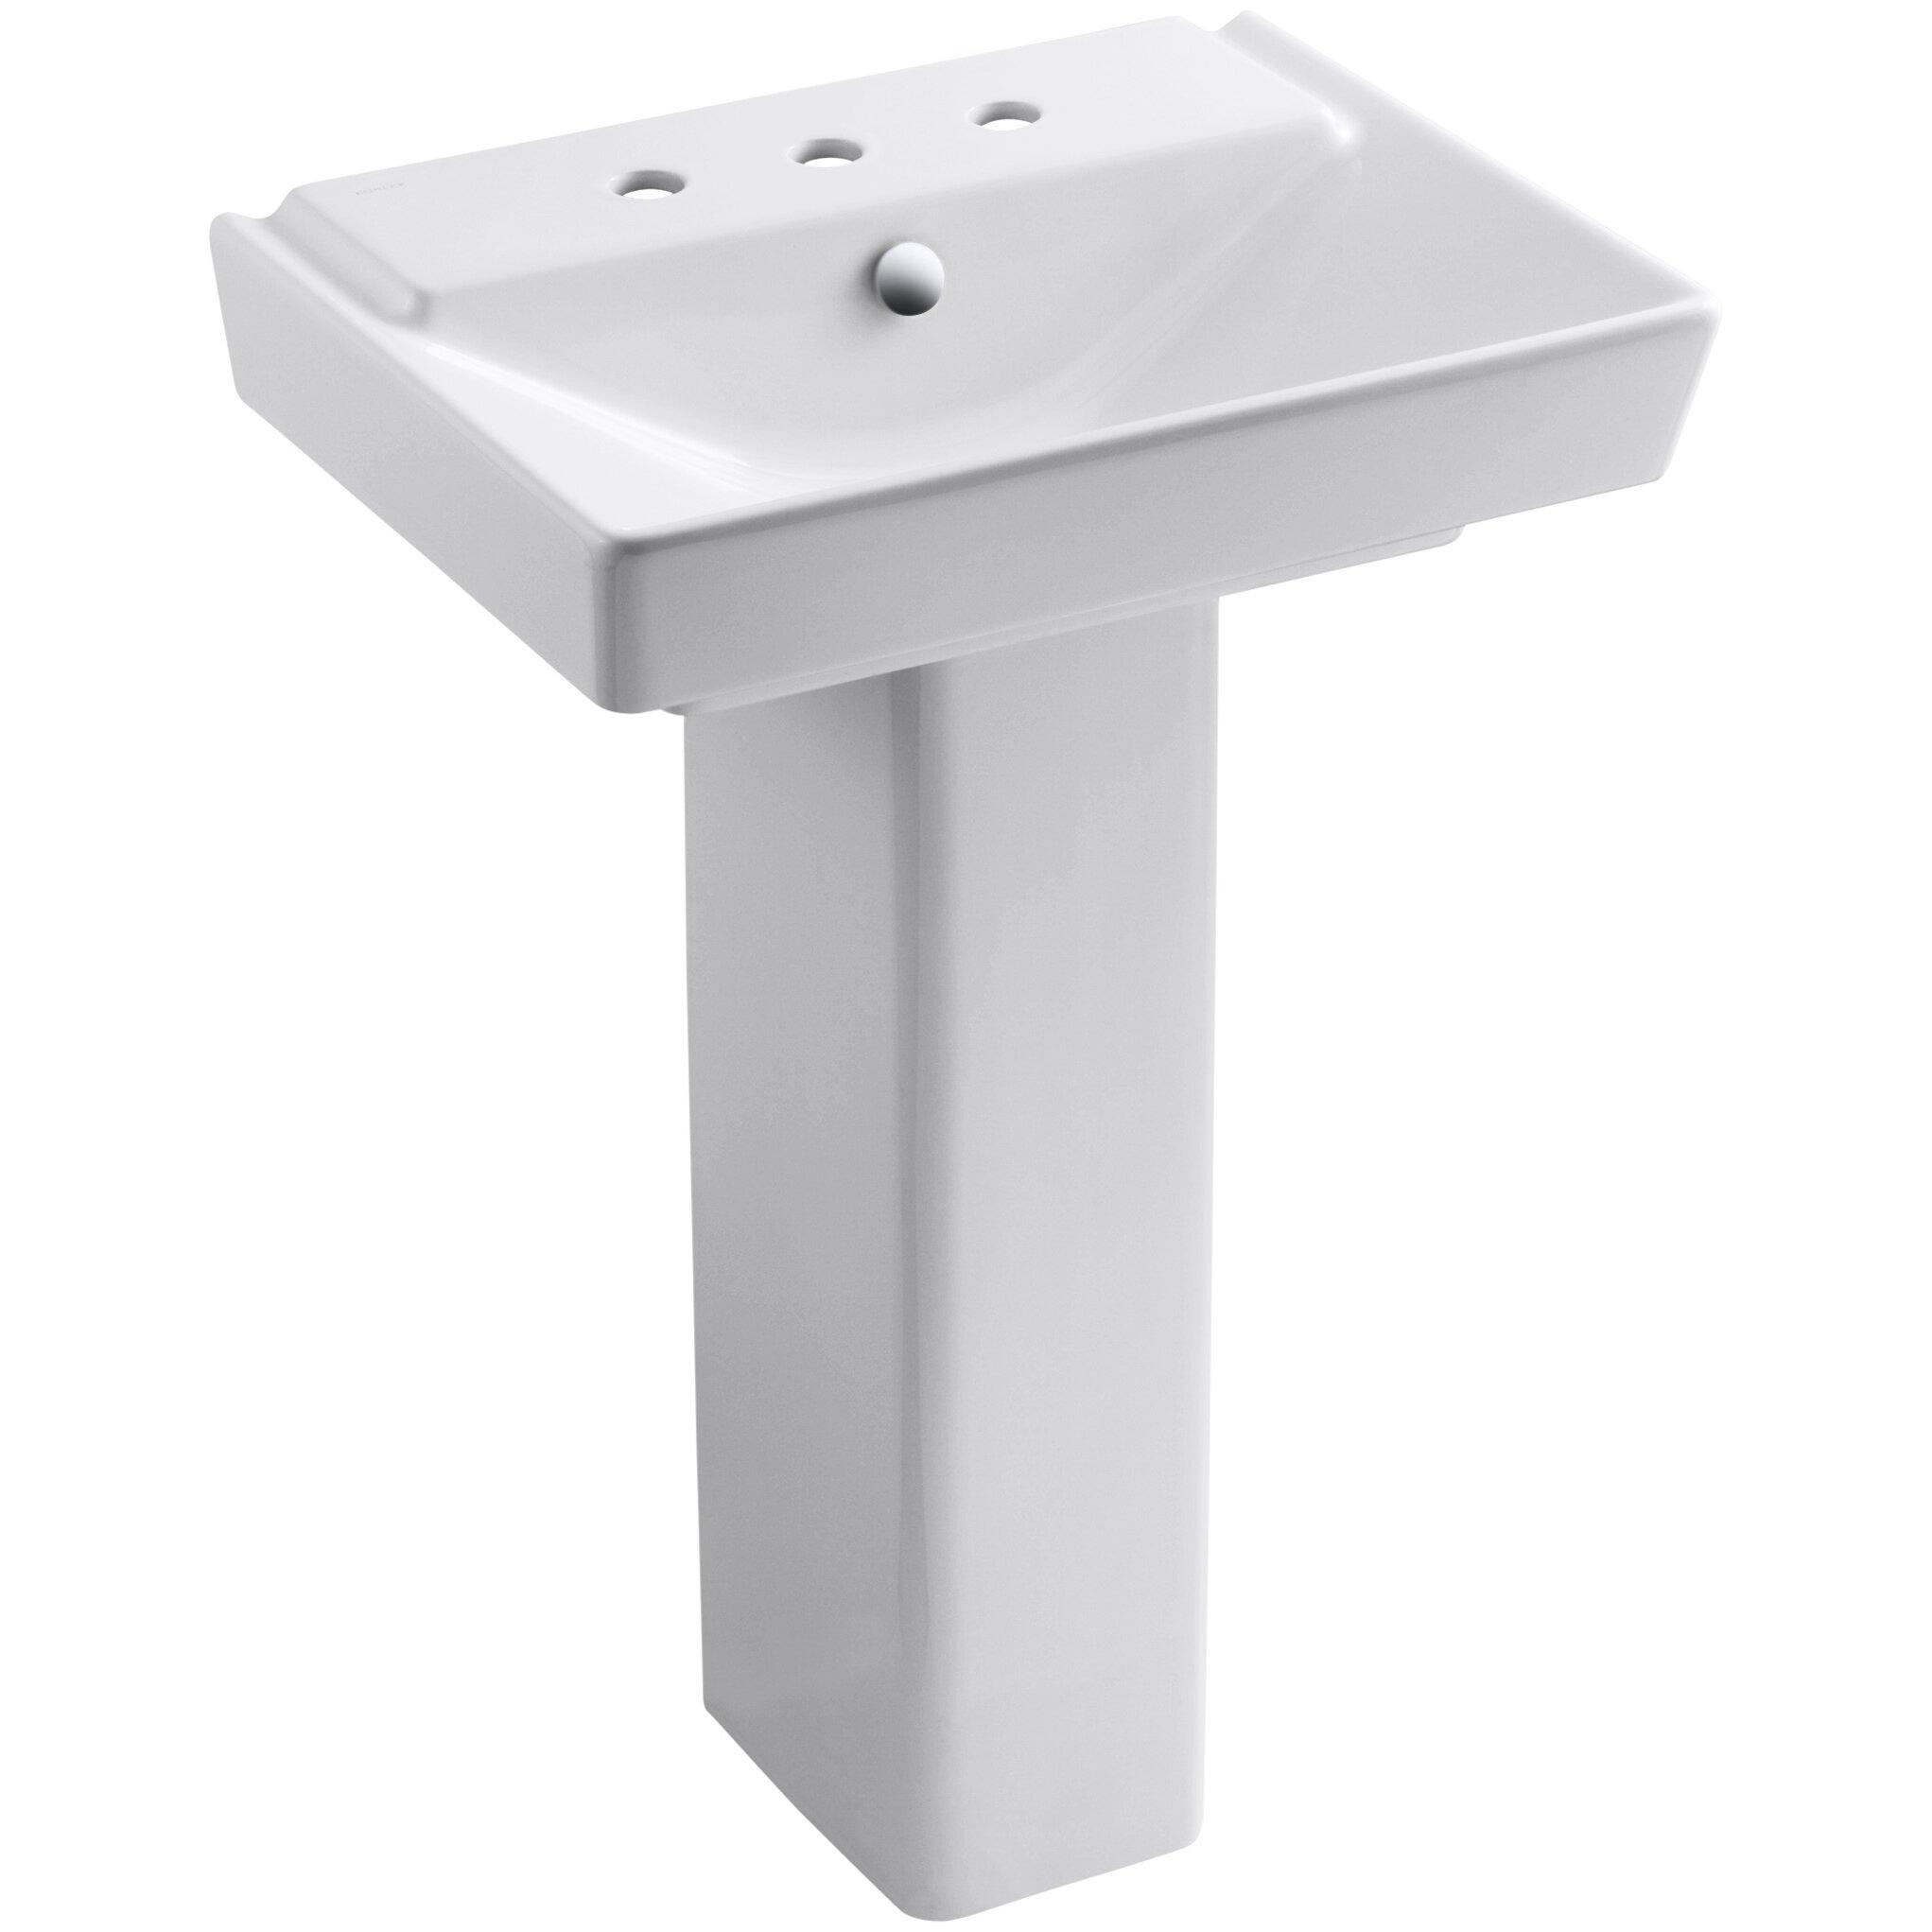 "Kohler Reve 36"" Pedestal Bathroom Sink & Reviews | Wayfair - Kohler Reve 36"" Pedestal Bathroom Sink"